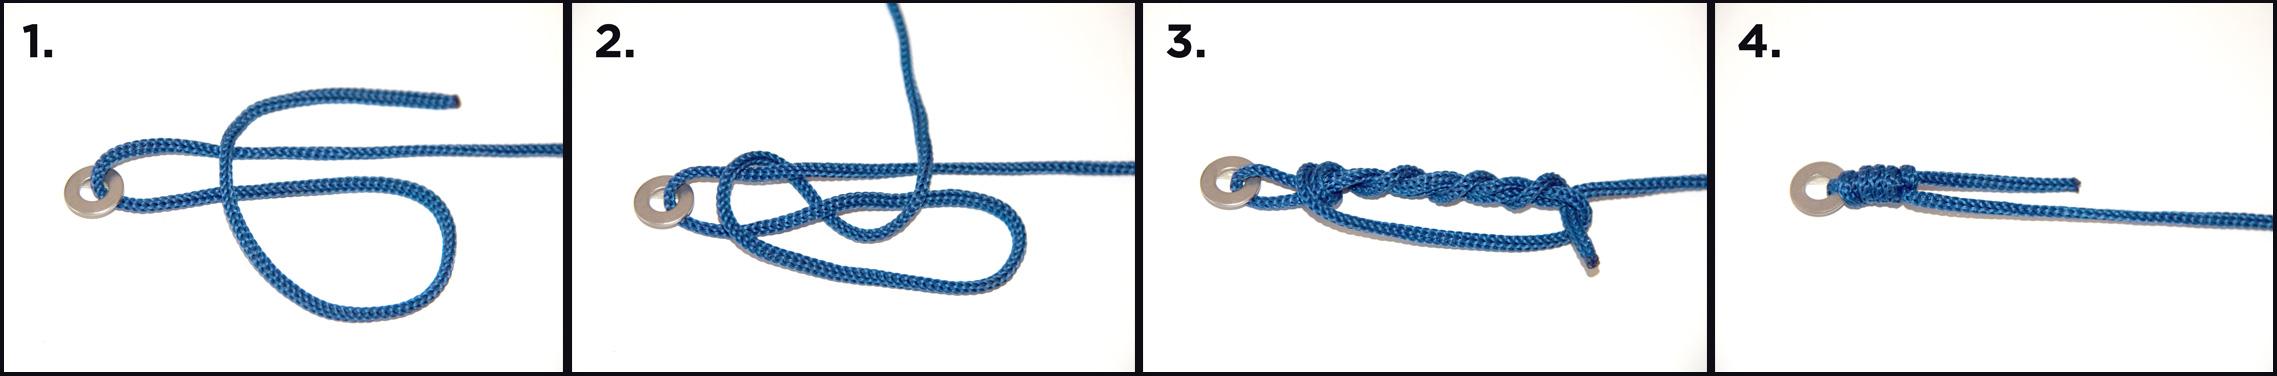 tying-a-uni-knot.jpg